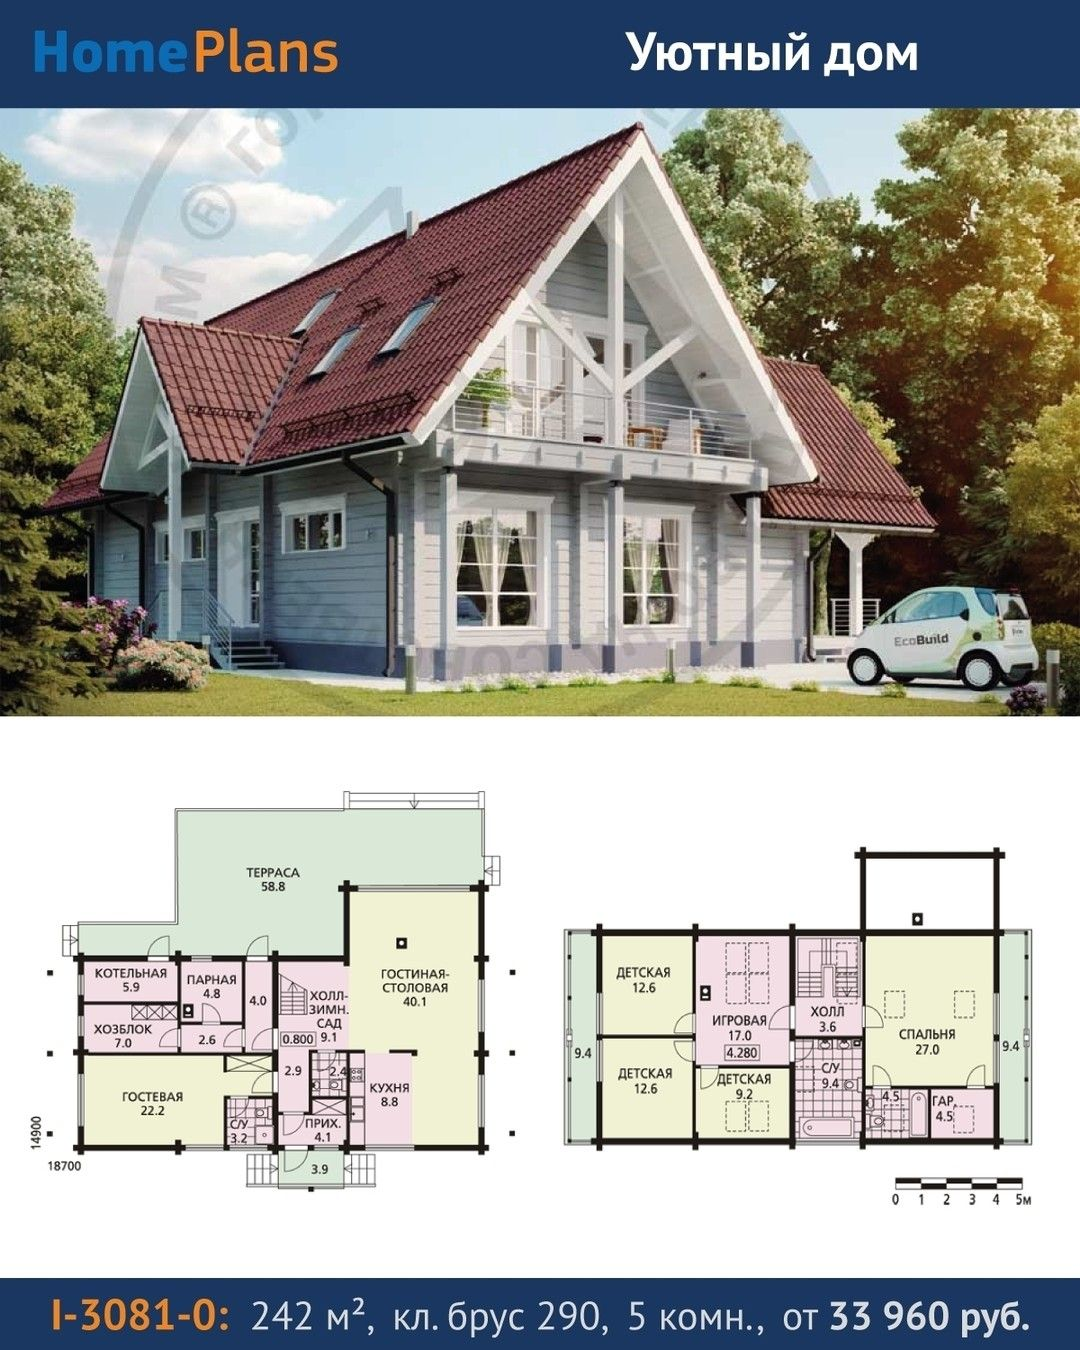 Modernes bungalow innenarchitektur wohnzimmer Проект i Уютный дом на все времена Если у вас большая семья